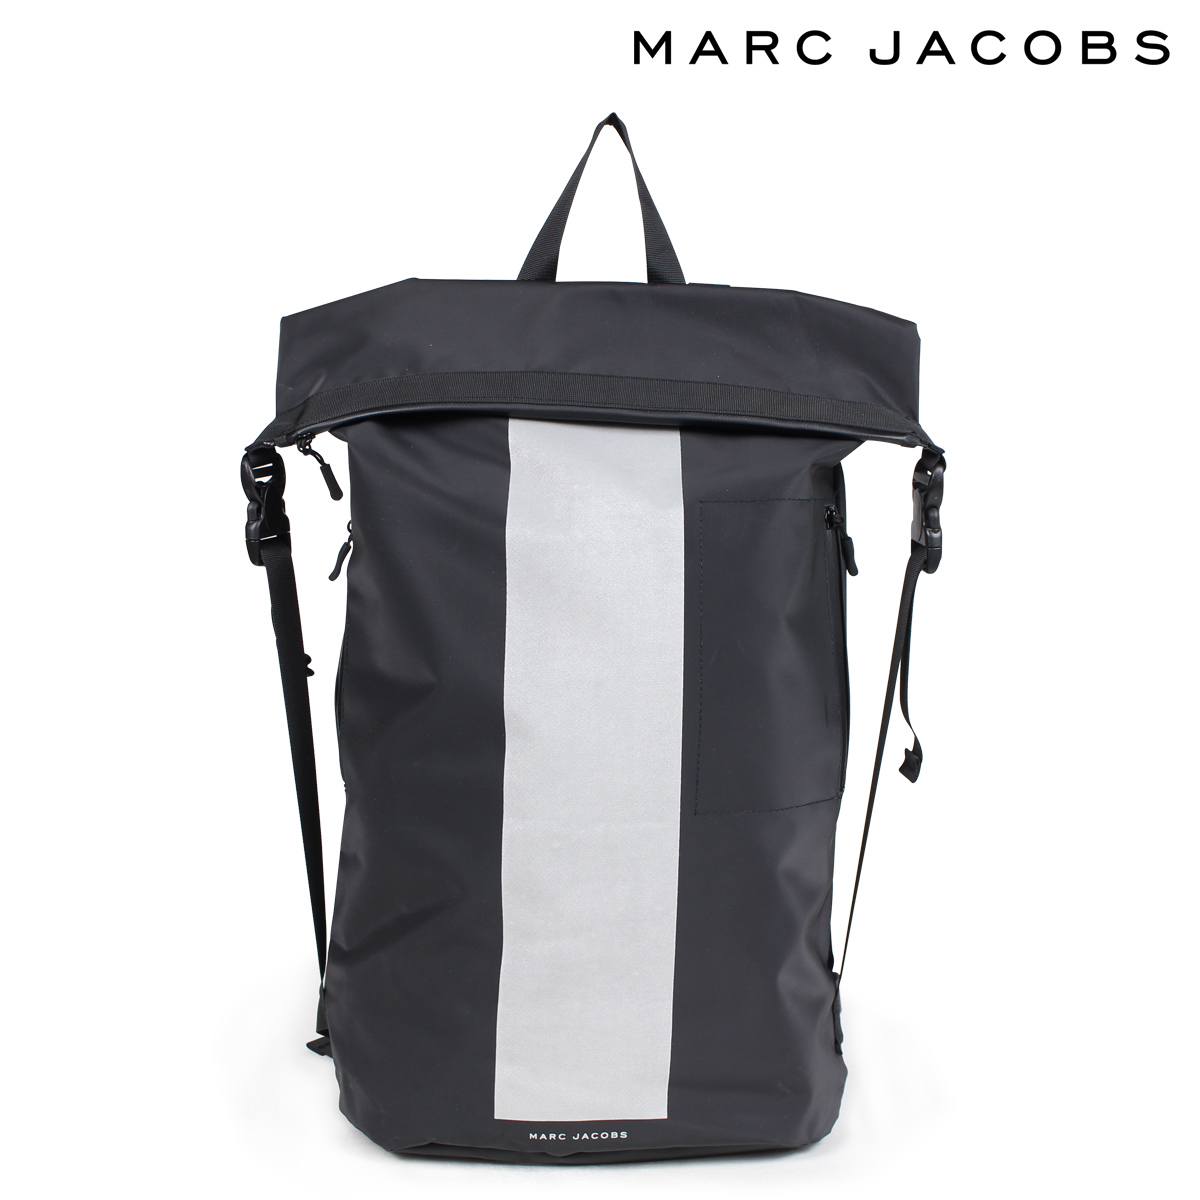 Sugar Online Shop  MARC JACOBS mark Jacobs bag rucksack Lady s men ... 30eb4fb78e1b5